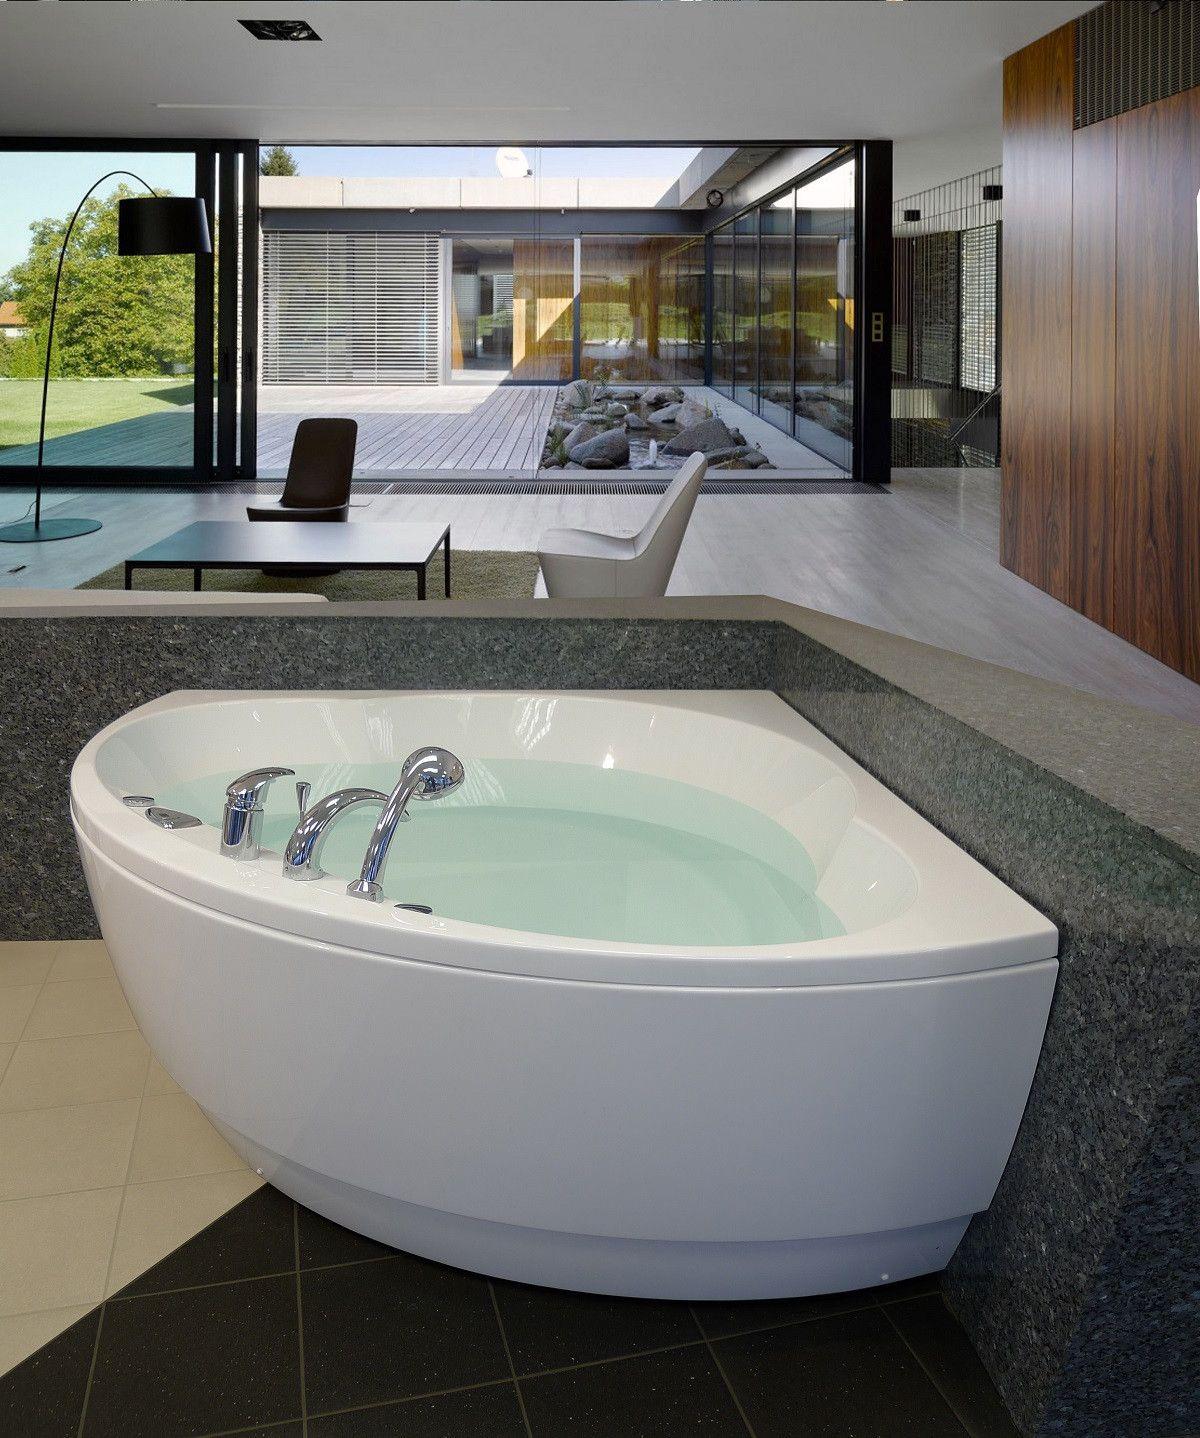 Aquatica Cleopatra: Two-Person Rounded Corner Soaking Tub | Heaven ...